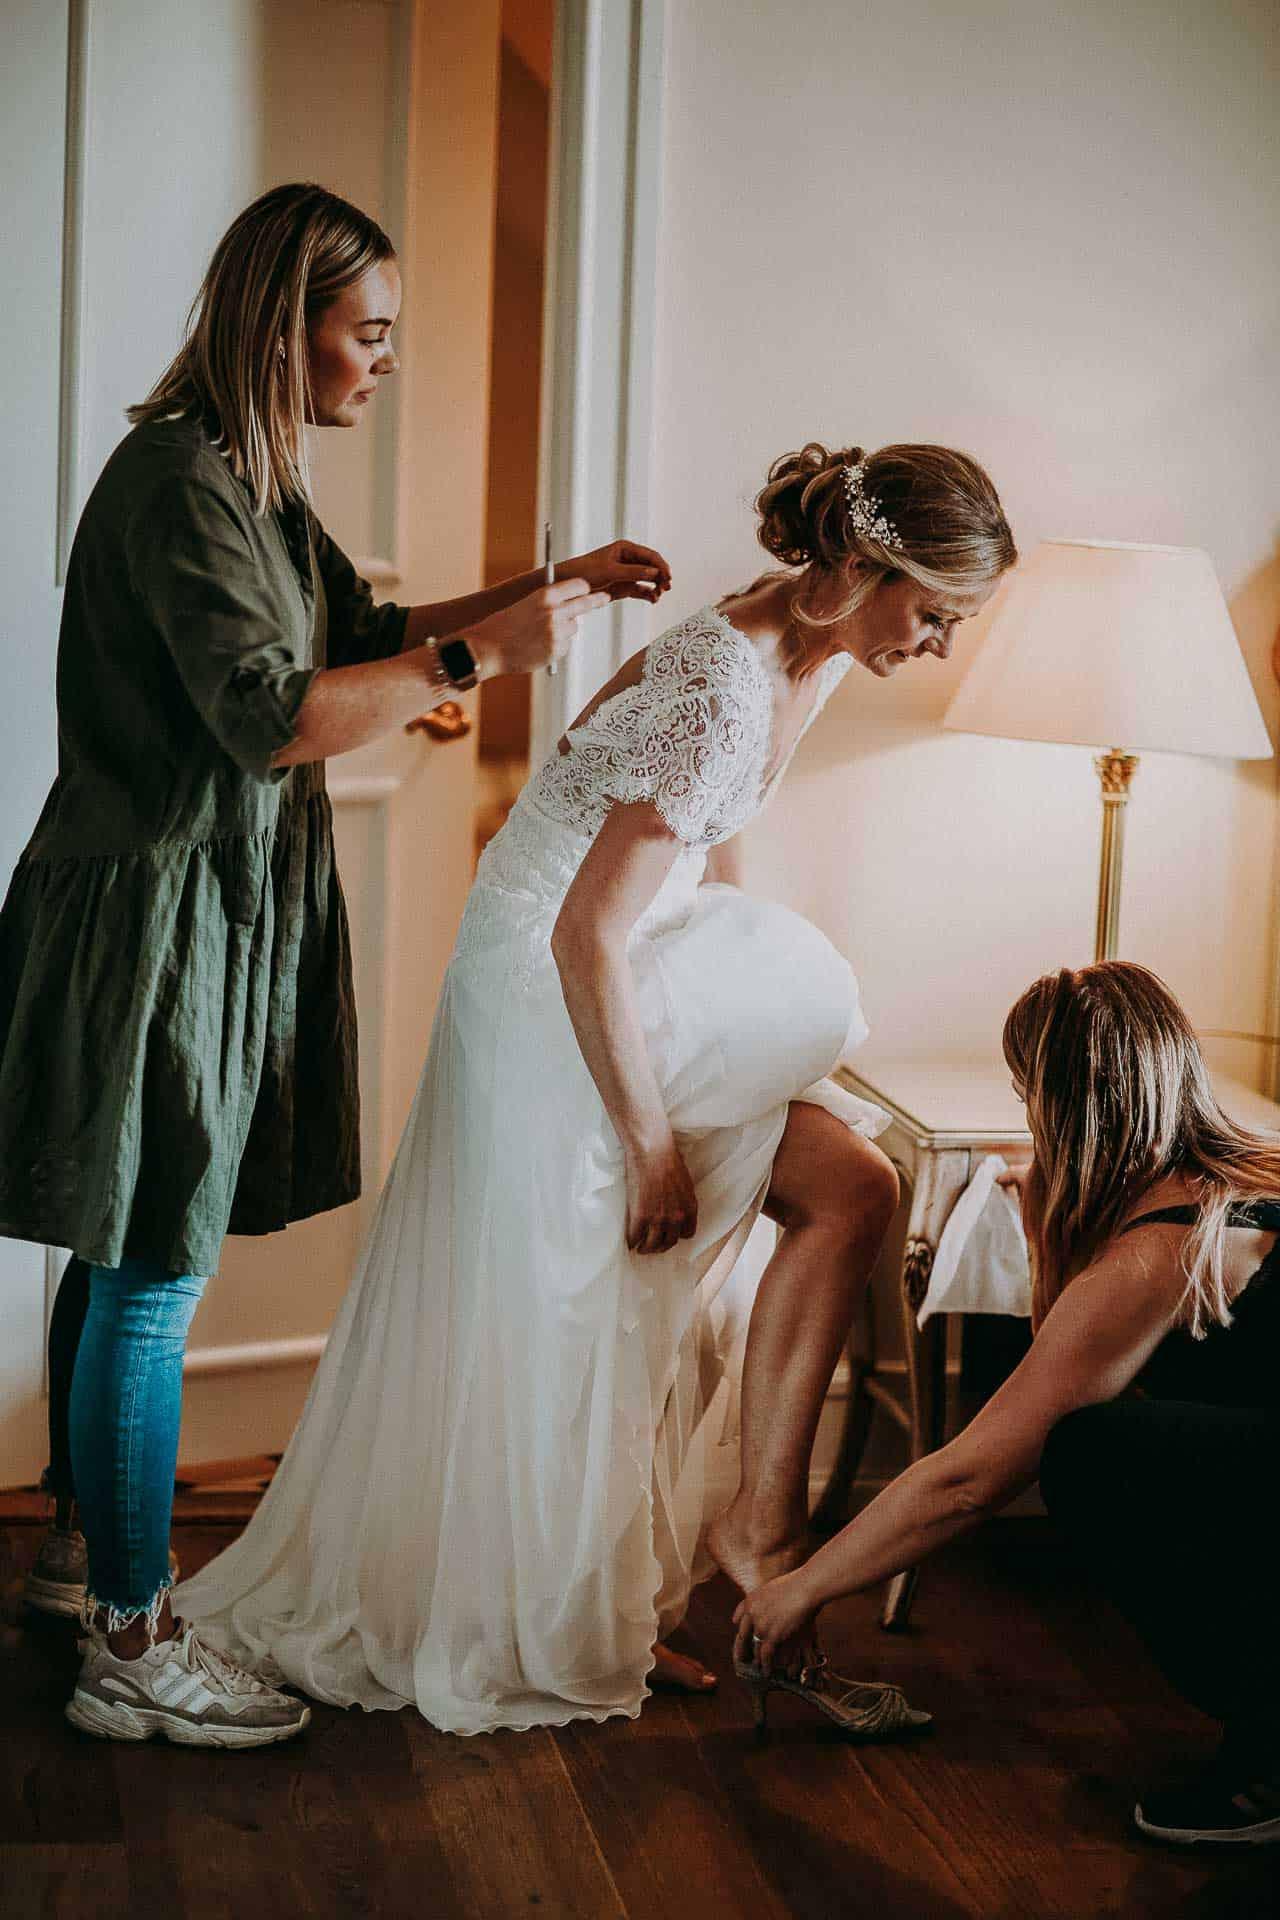 Kokkedal slot - Bryllupsforberedelser